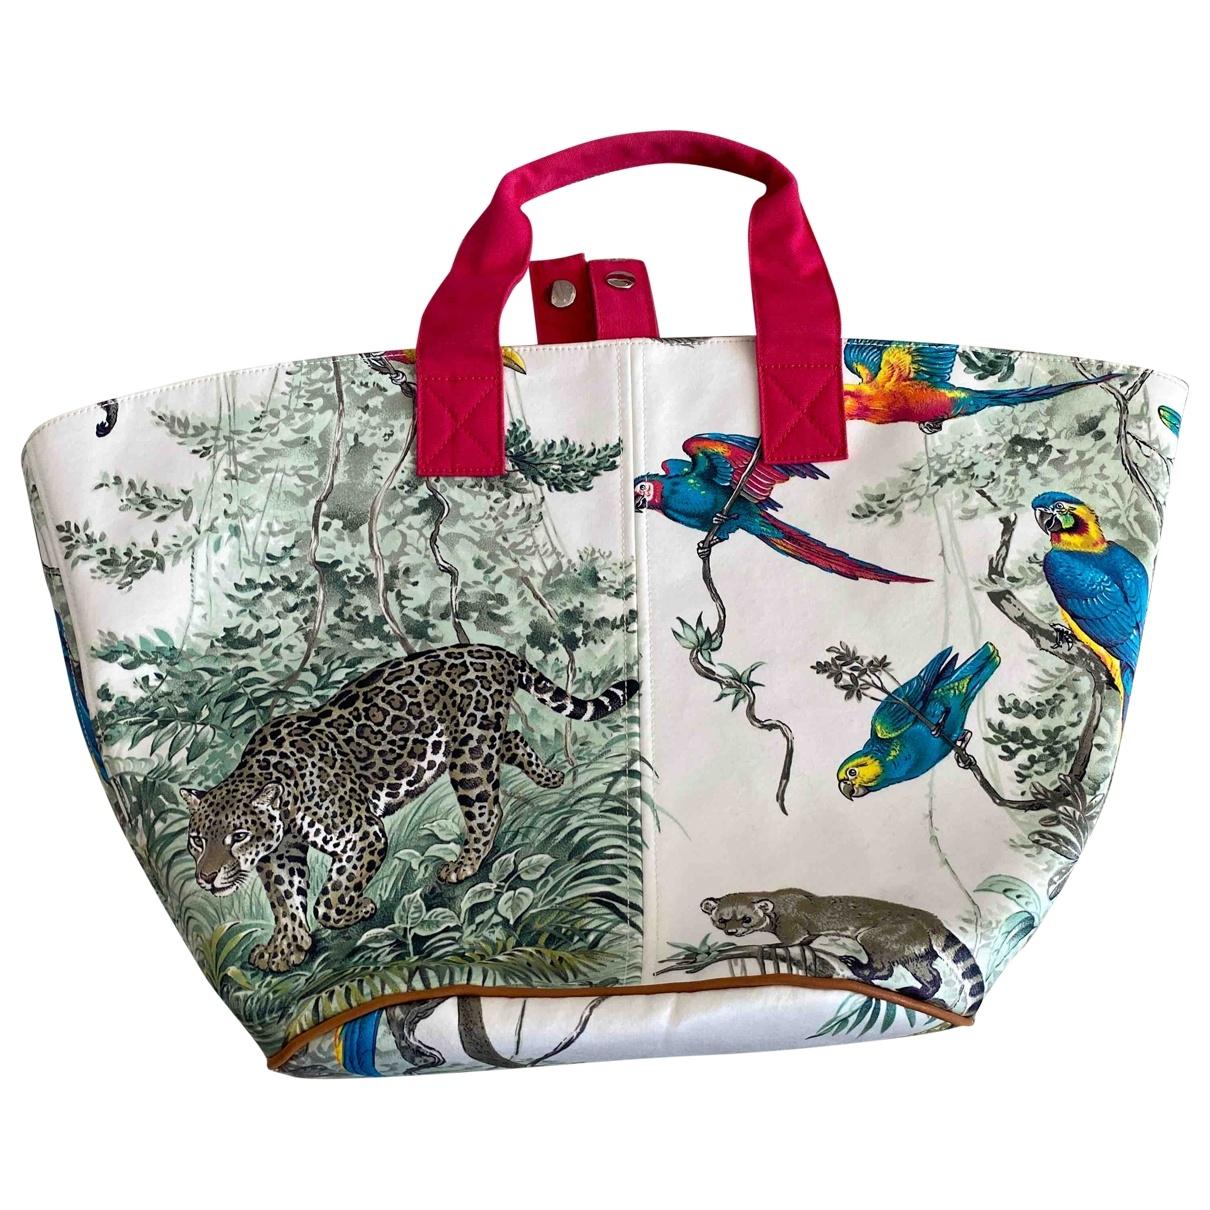 Hermès \N Beige Cotton handbag for Women \N